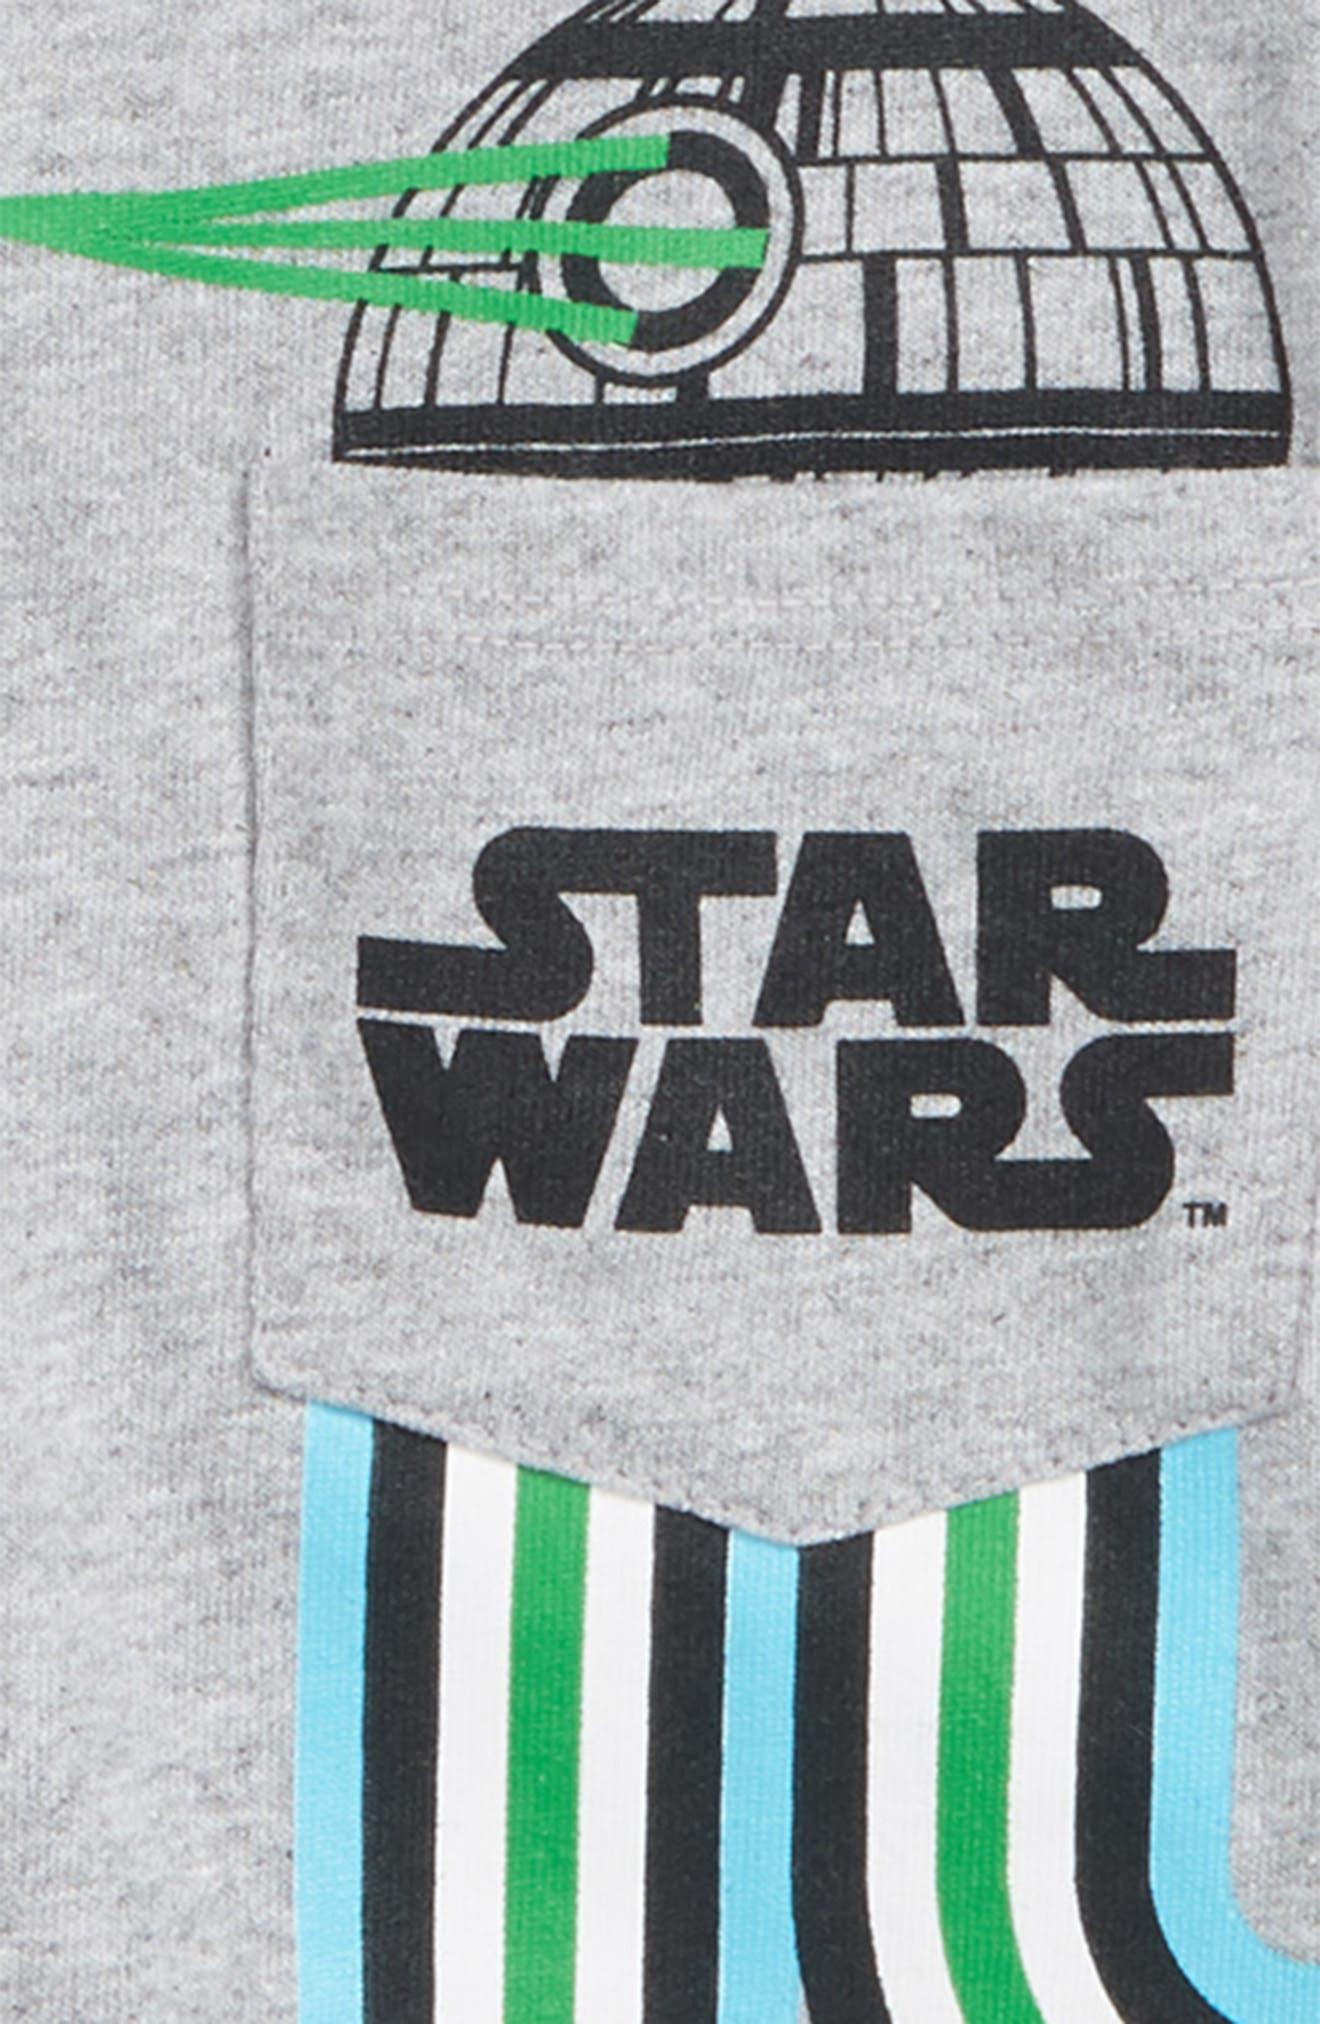 Star Wars Death Star Pocket T-Shirt,                             Alternate thumbnail 2, color,                             HEATHER GREY/ LIGHT BLUE